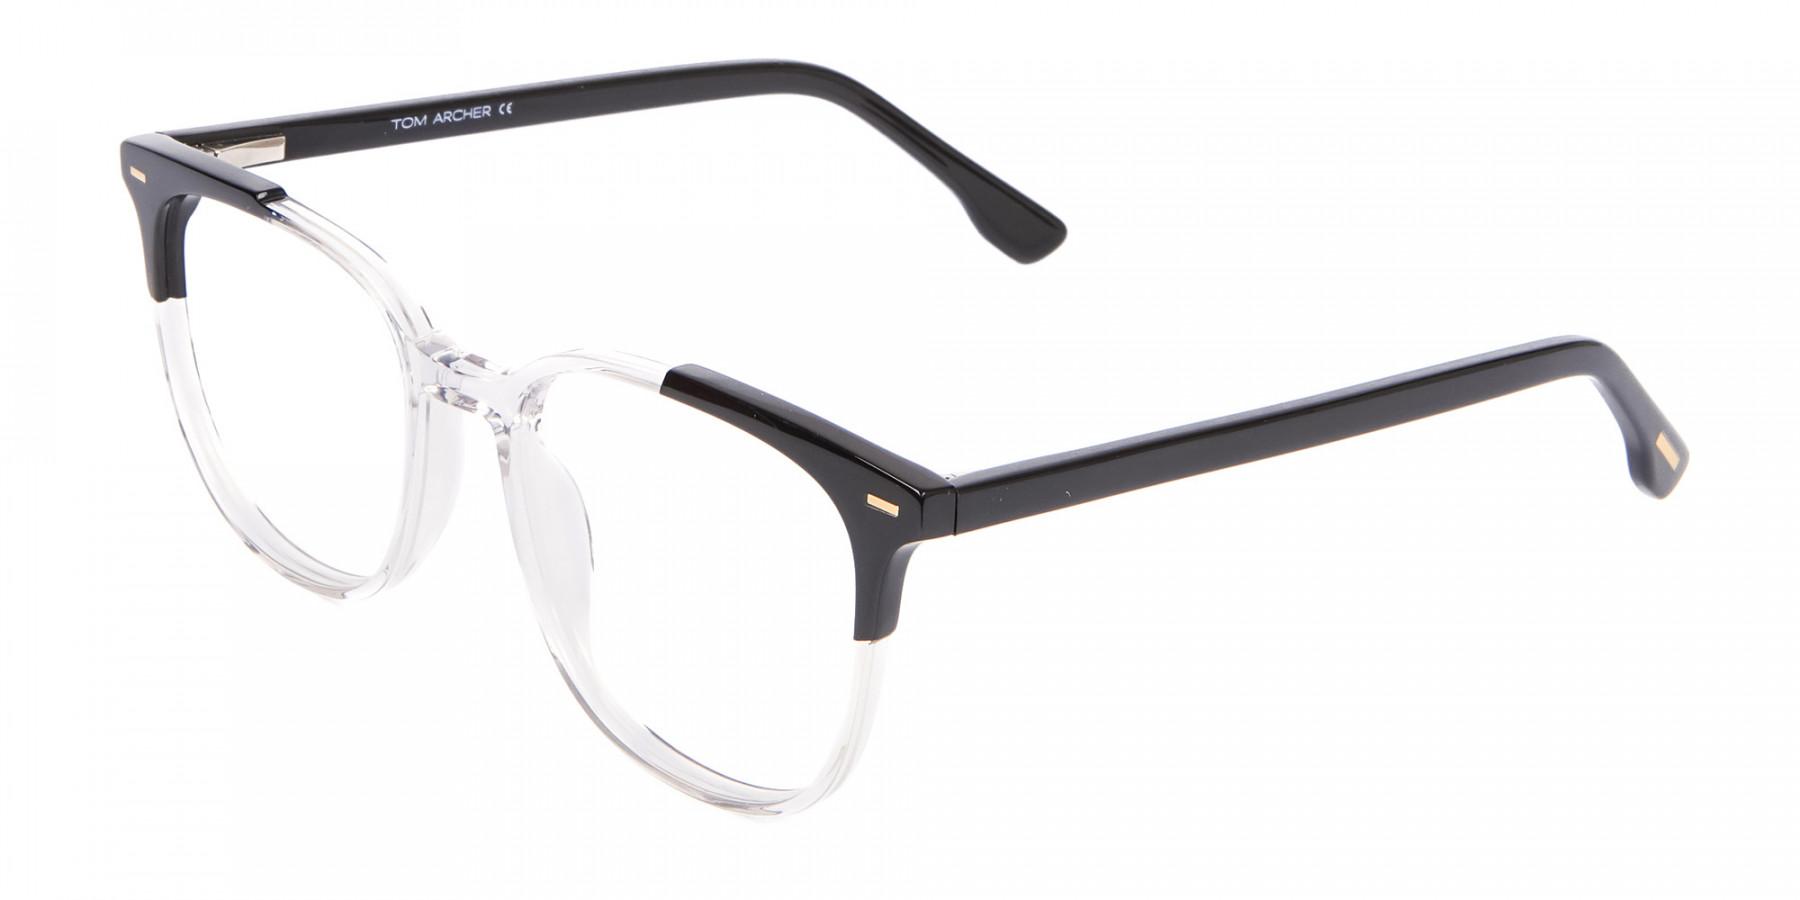 Geek Chic Wayfarer Frame Black & Translucent - 1